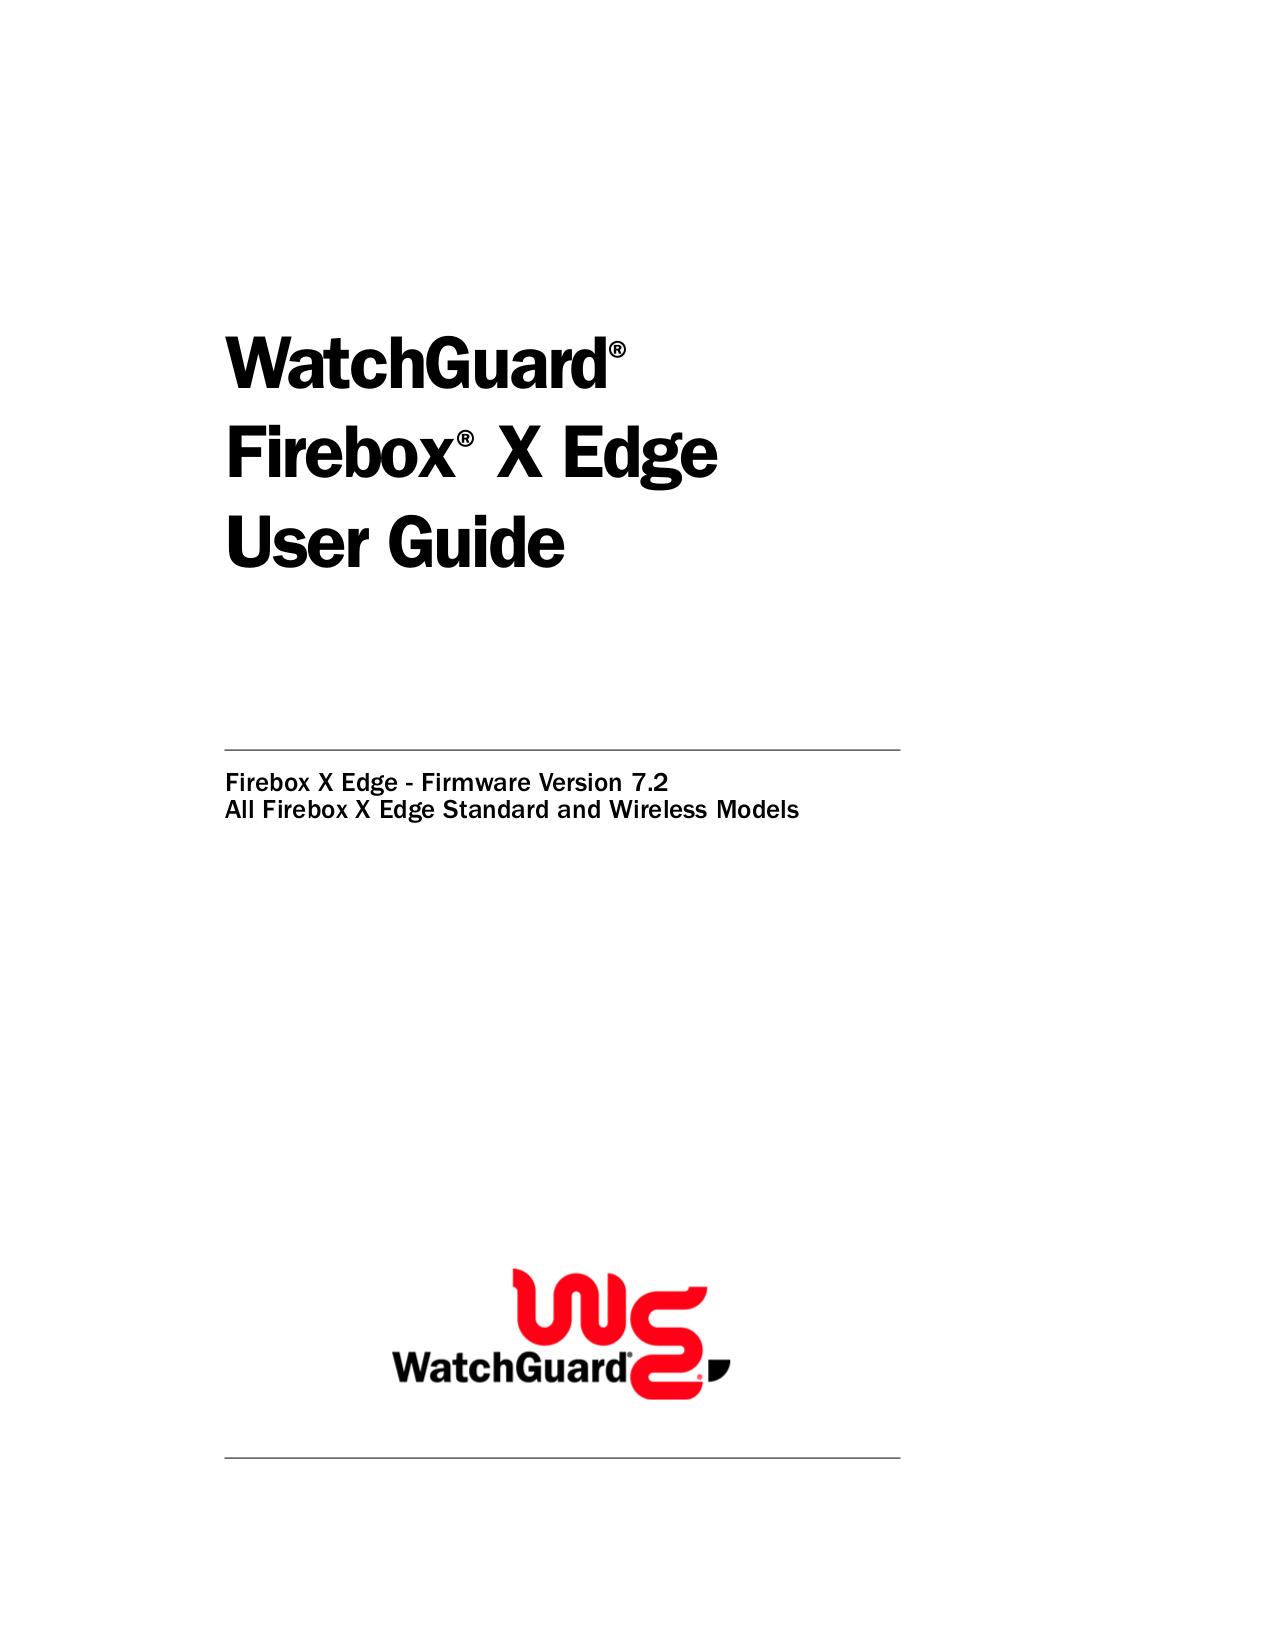 pdf for Watchguard Wireless Router Firebox X10E-W manual